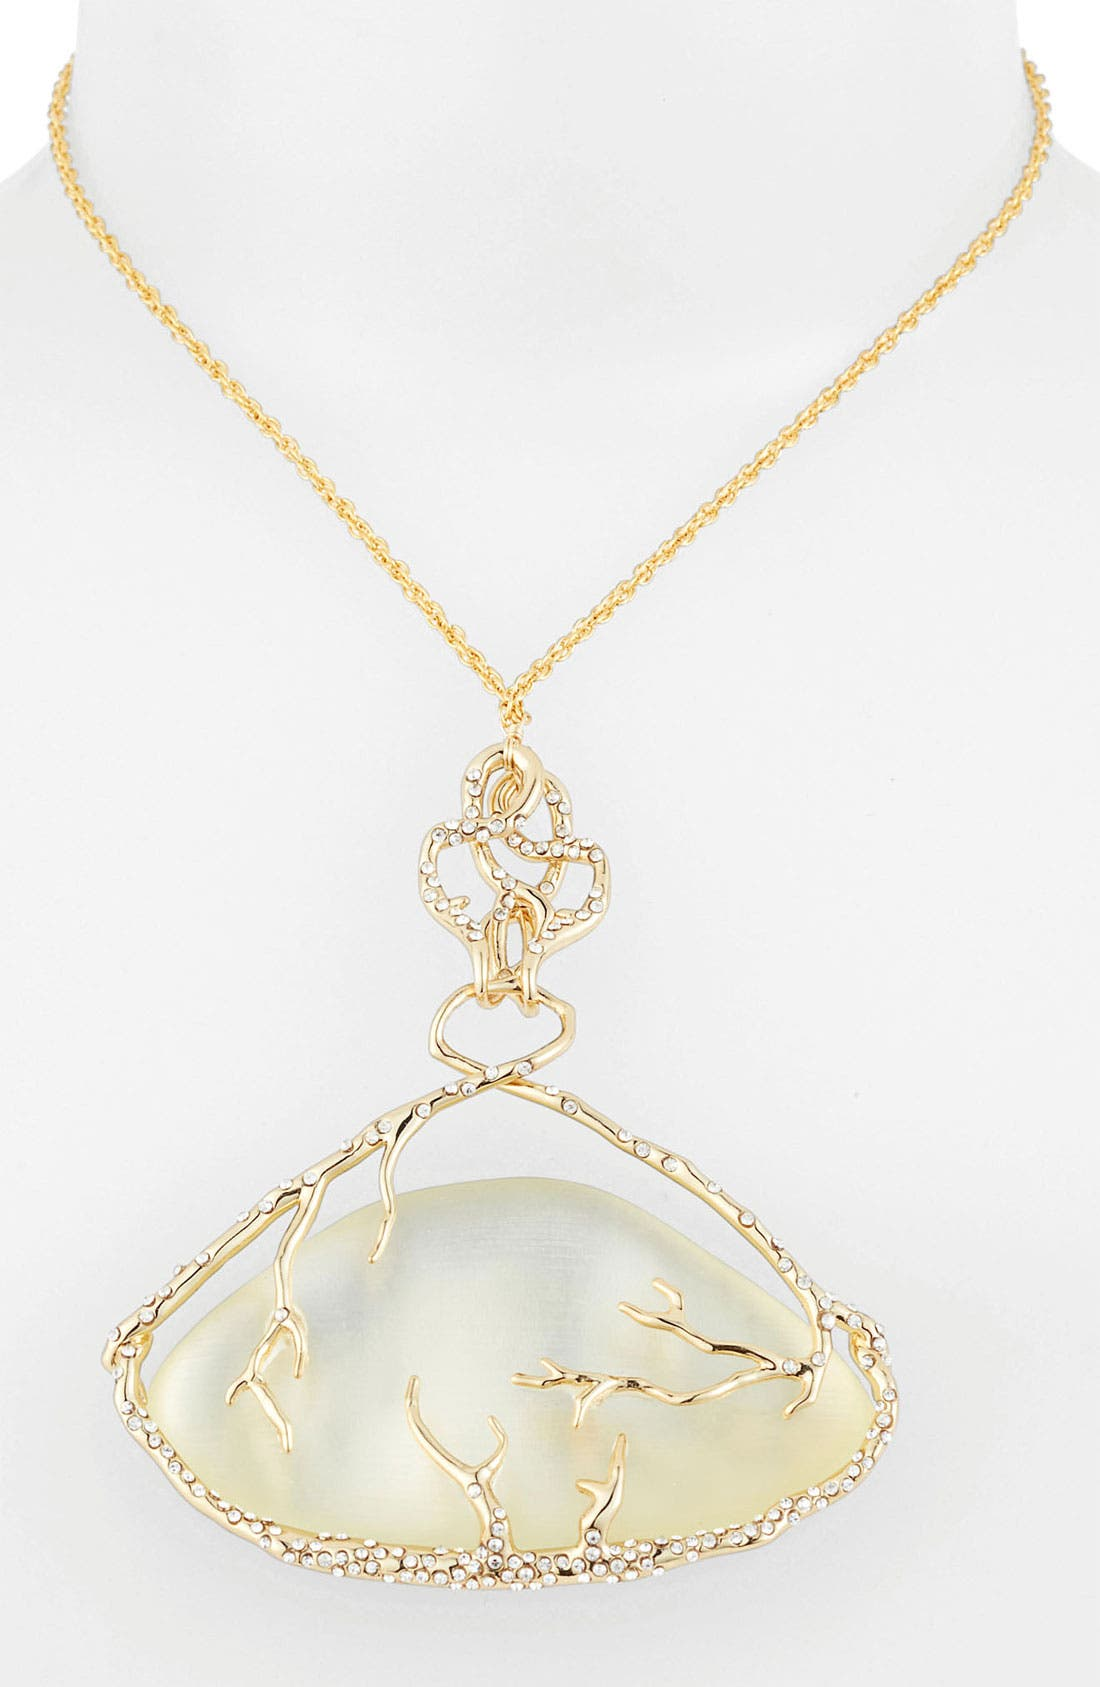 Main Image - Alexis Bittar 'Ophelia' Vine Pendant Necklace